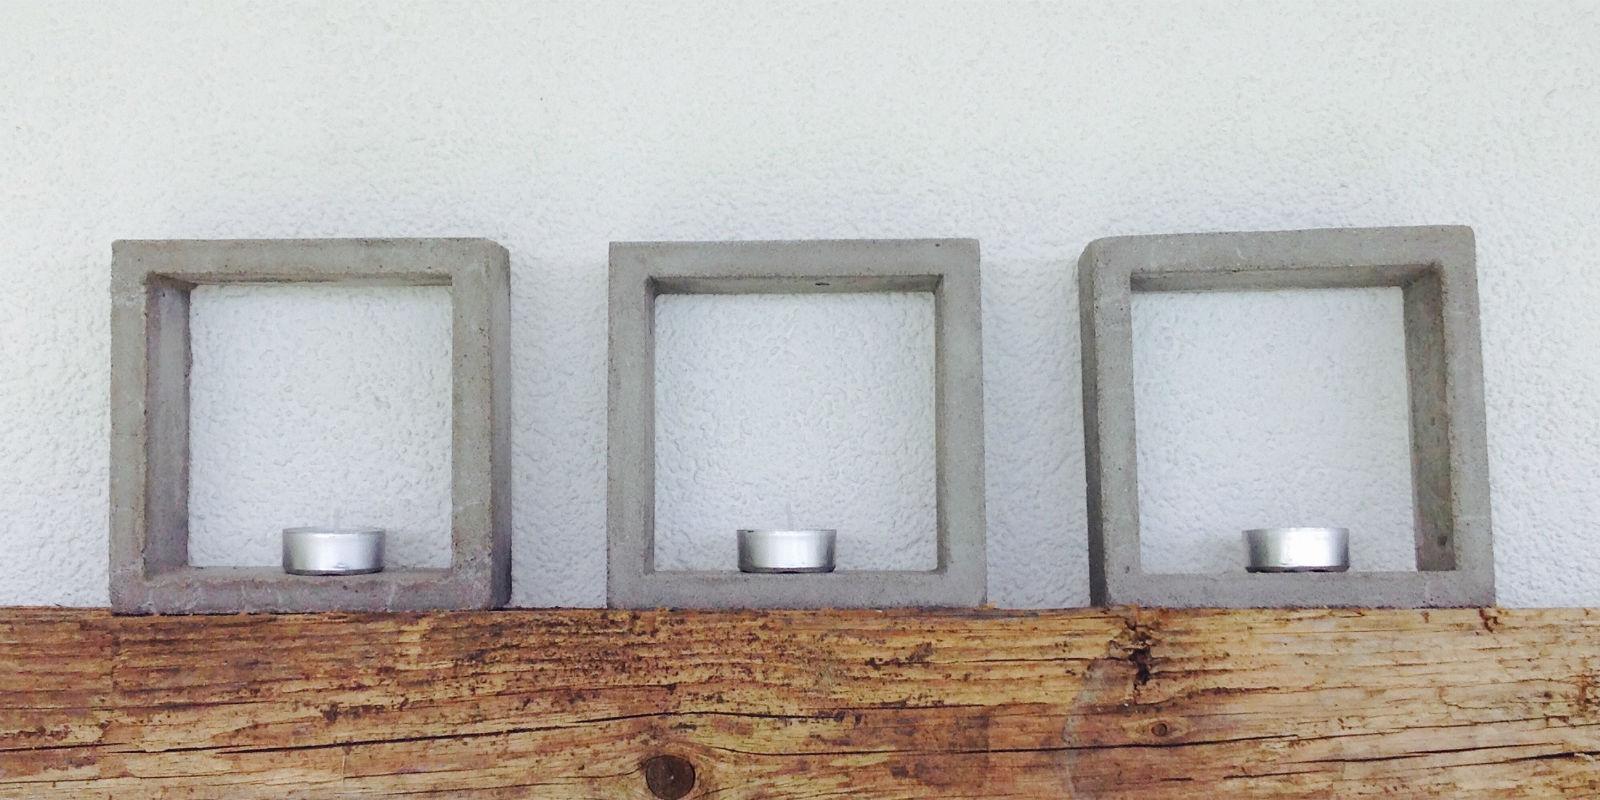 kerzen rahmen beton 05 kunst aus beton. Black Bedroom Furniture Sets. Home Design Ideas